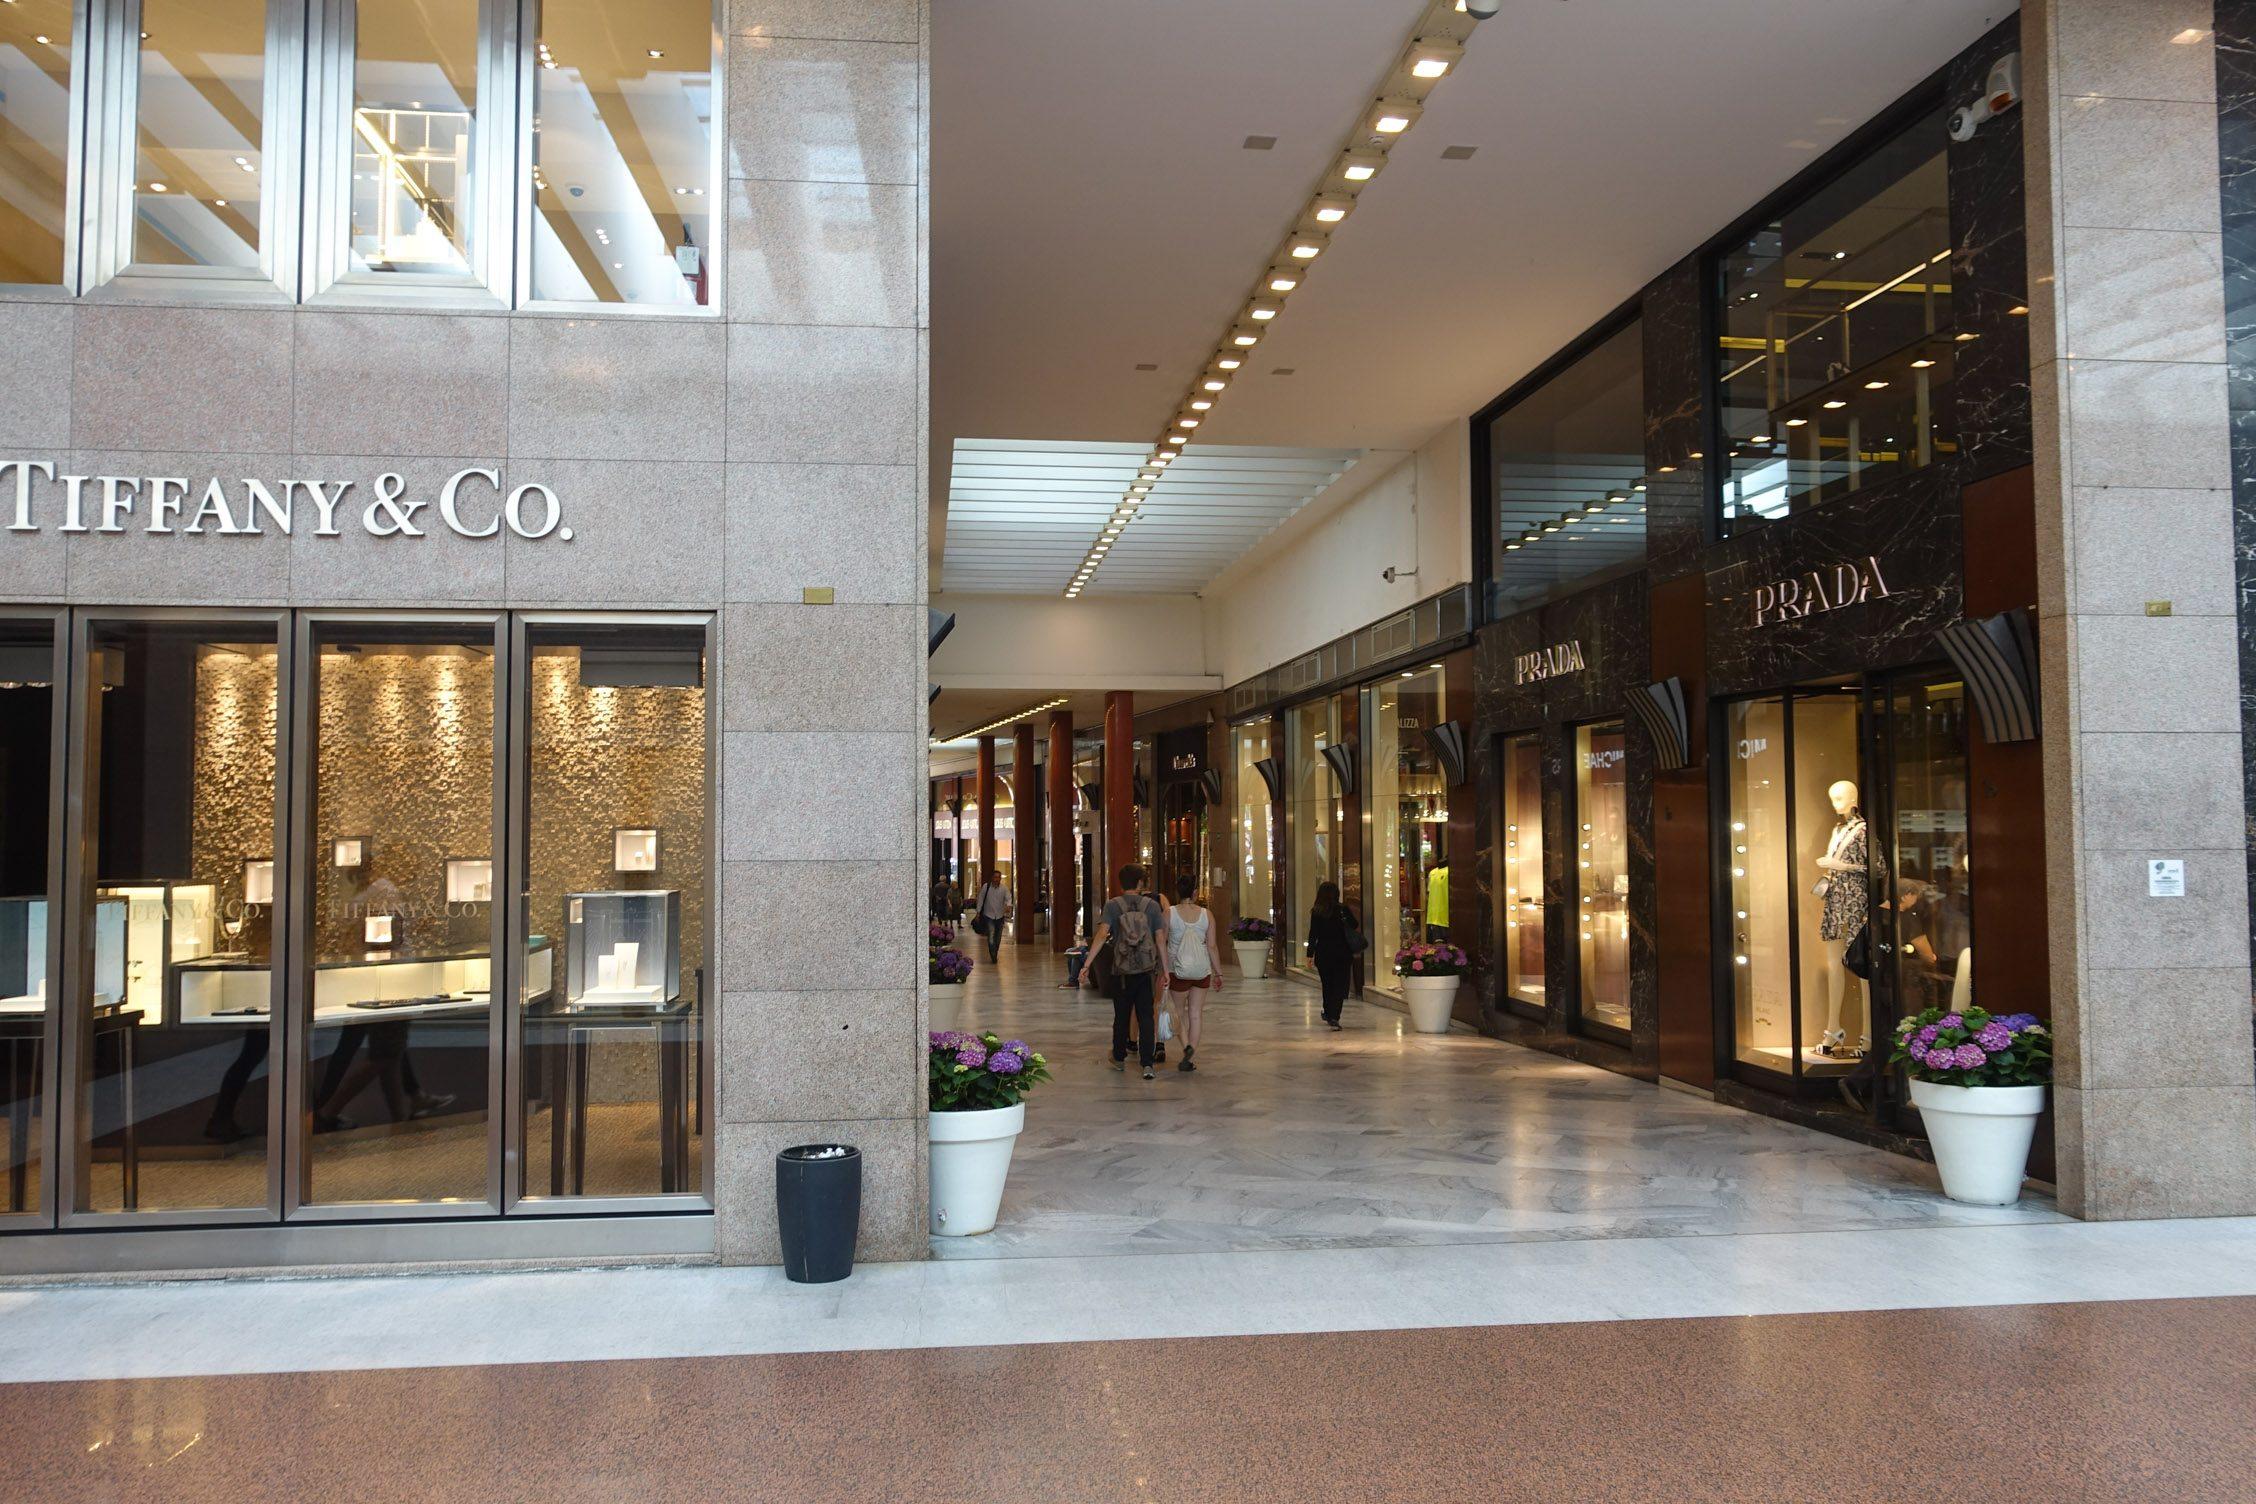 exclusief shoppen in de Galleria Cavour